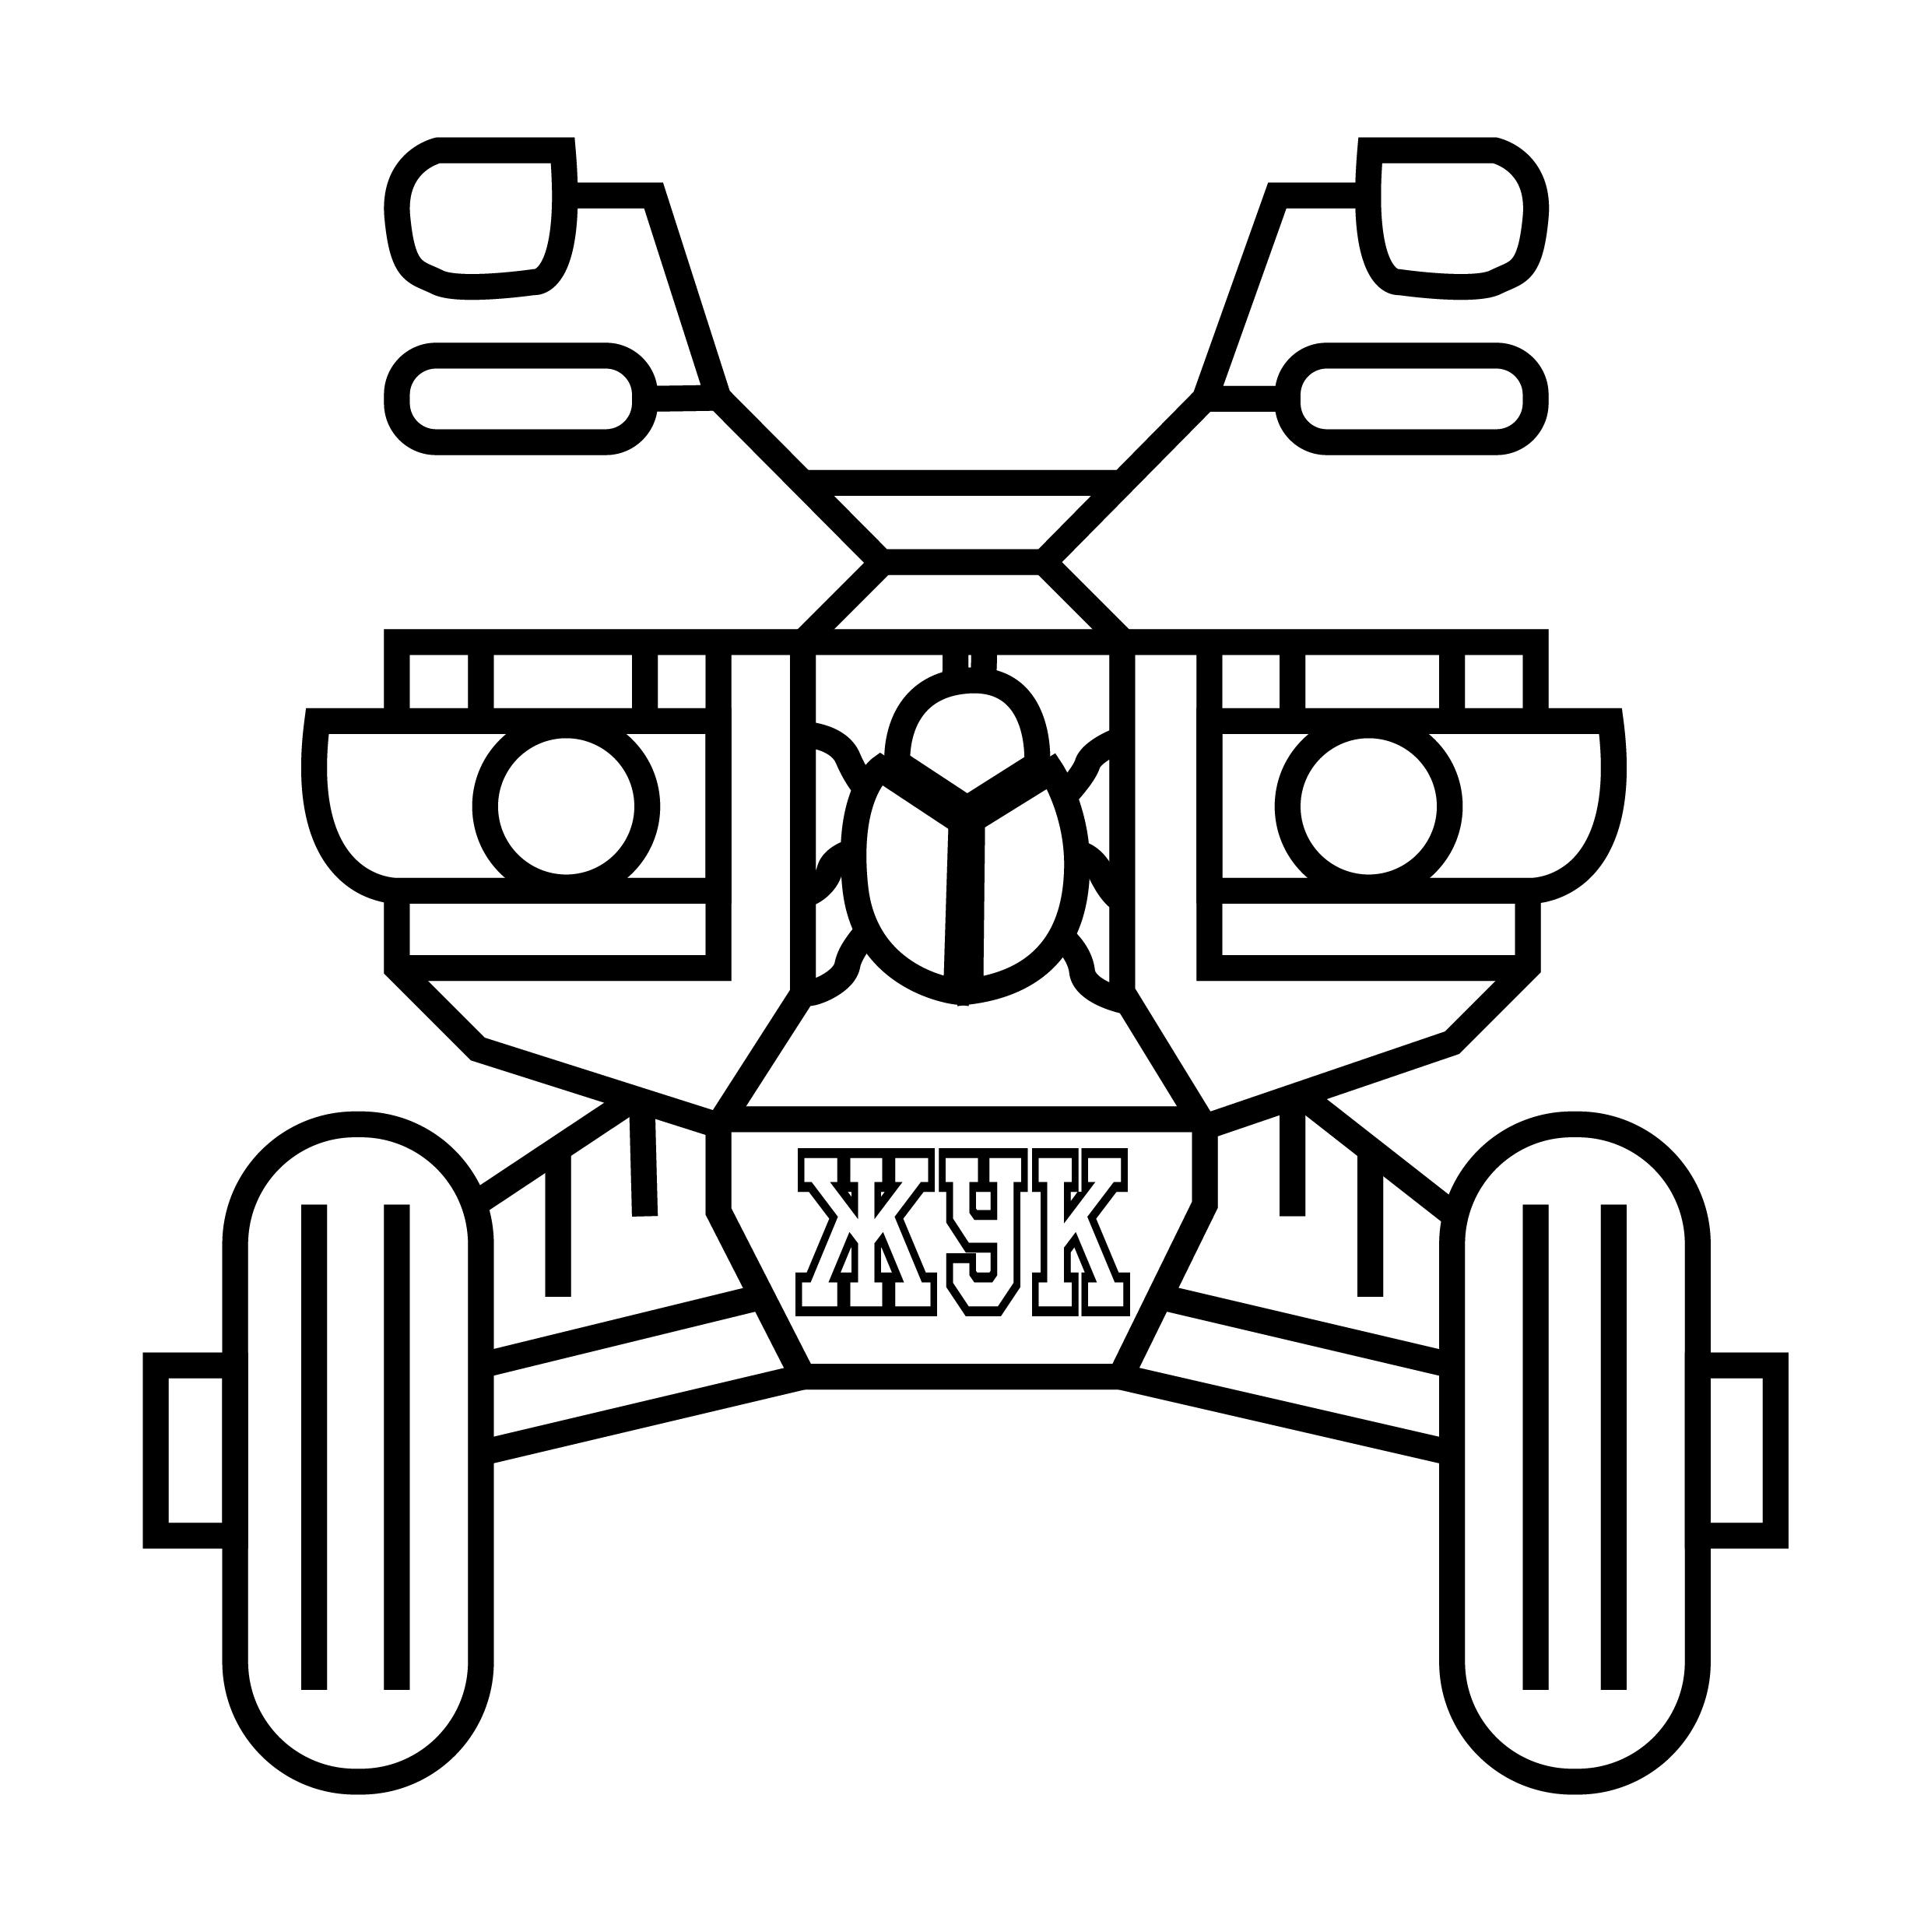 Нужен логотип (эмблема) для самодельного квадроцикла фото f_0365afd6868b960e.jpg